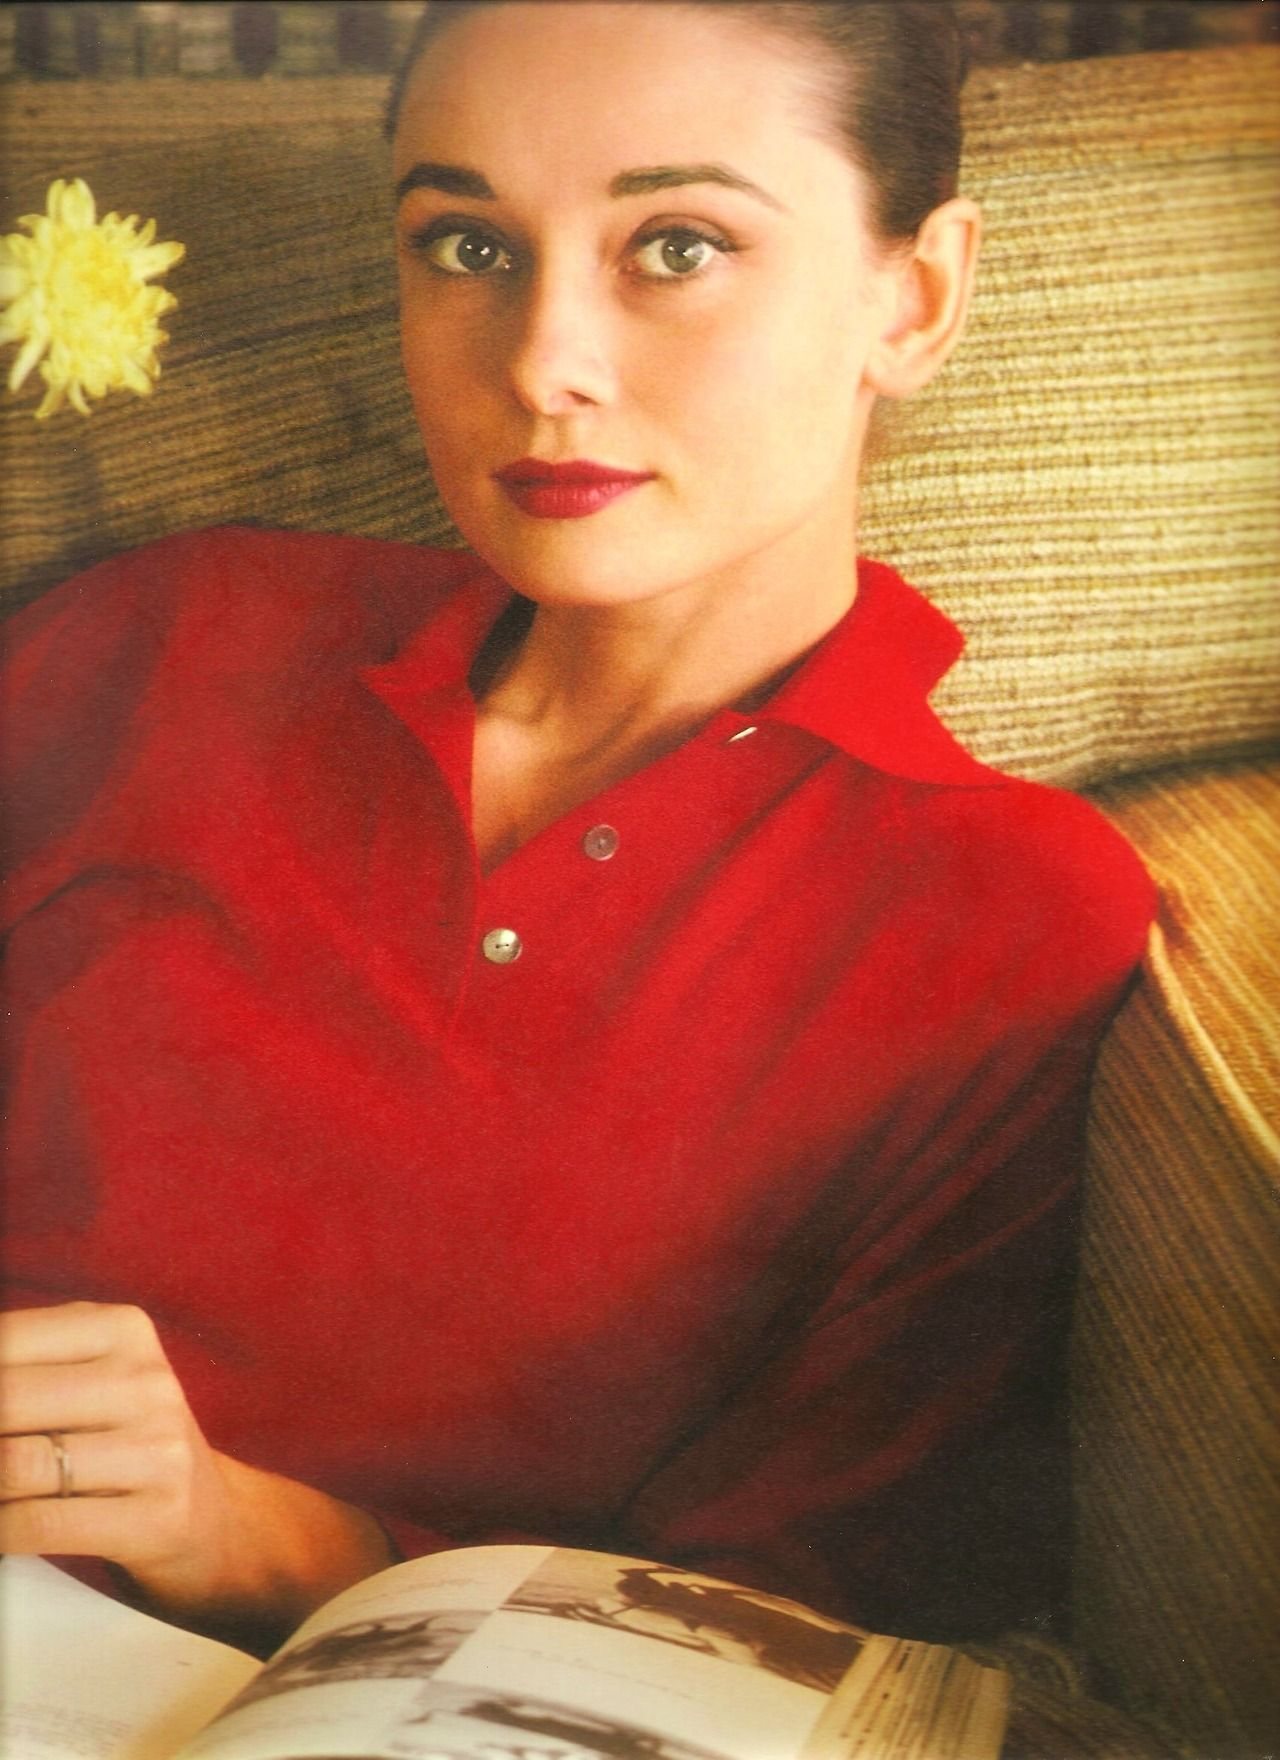 Lefi Corbantis Audrey Hepburn Photos Audrey Hepburn Style Audrey Hepburn